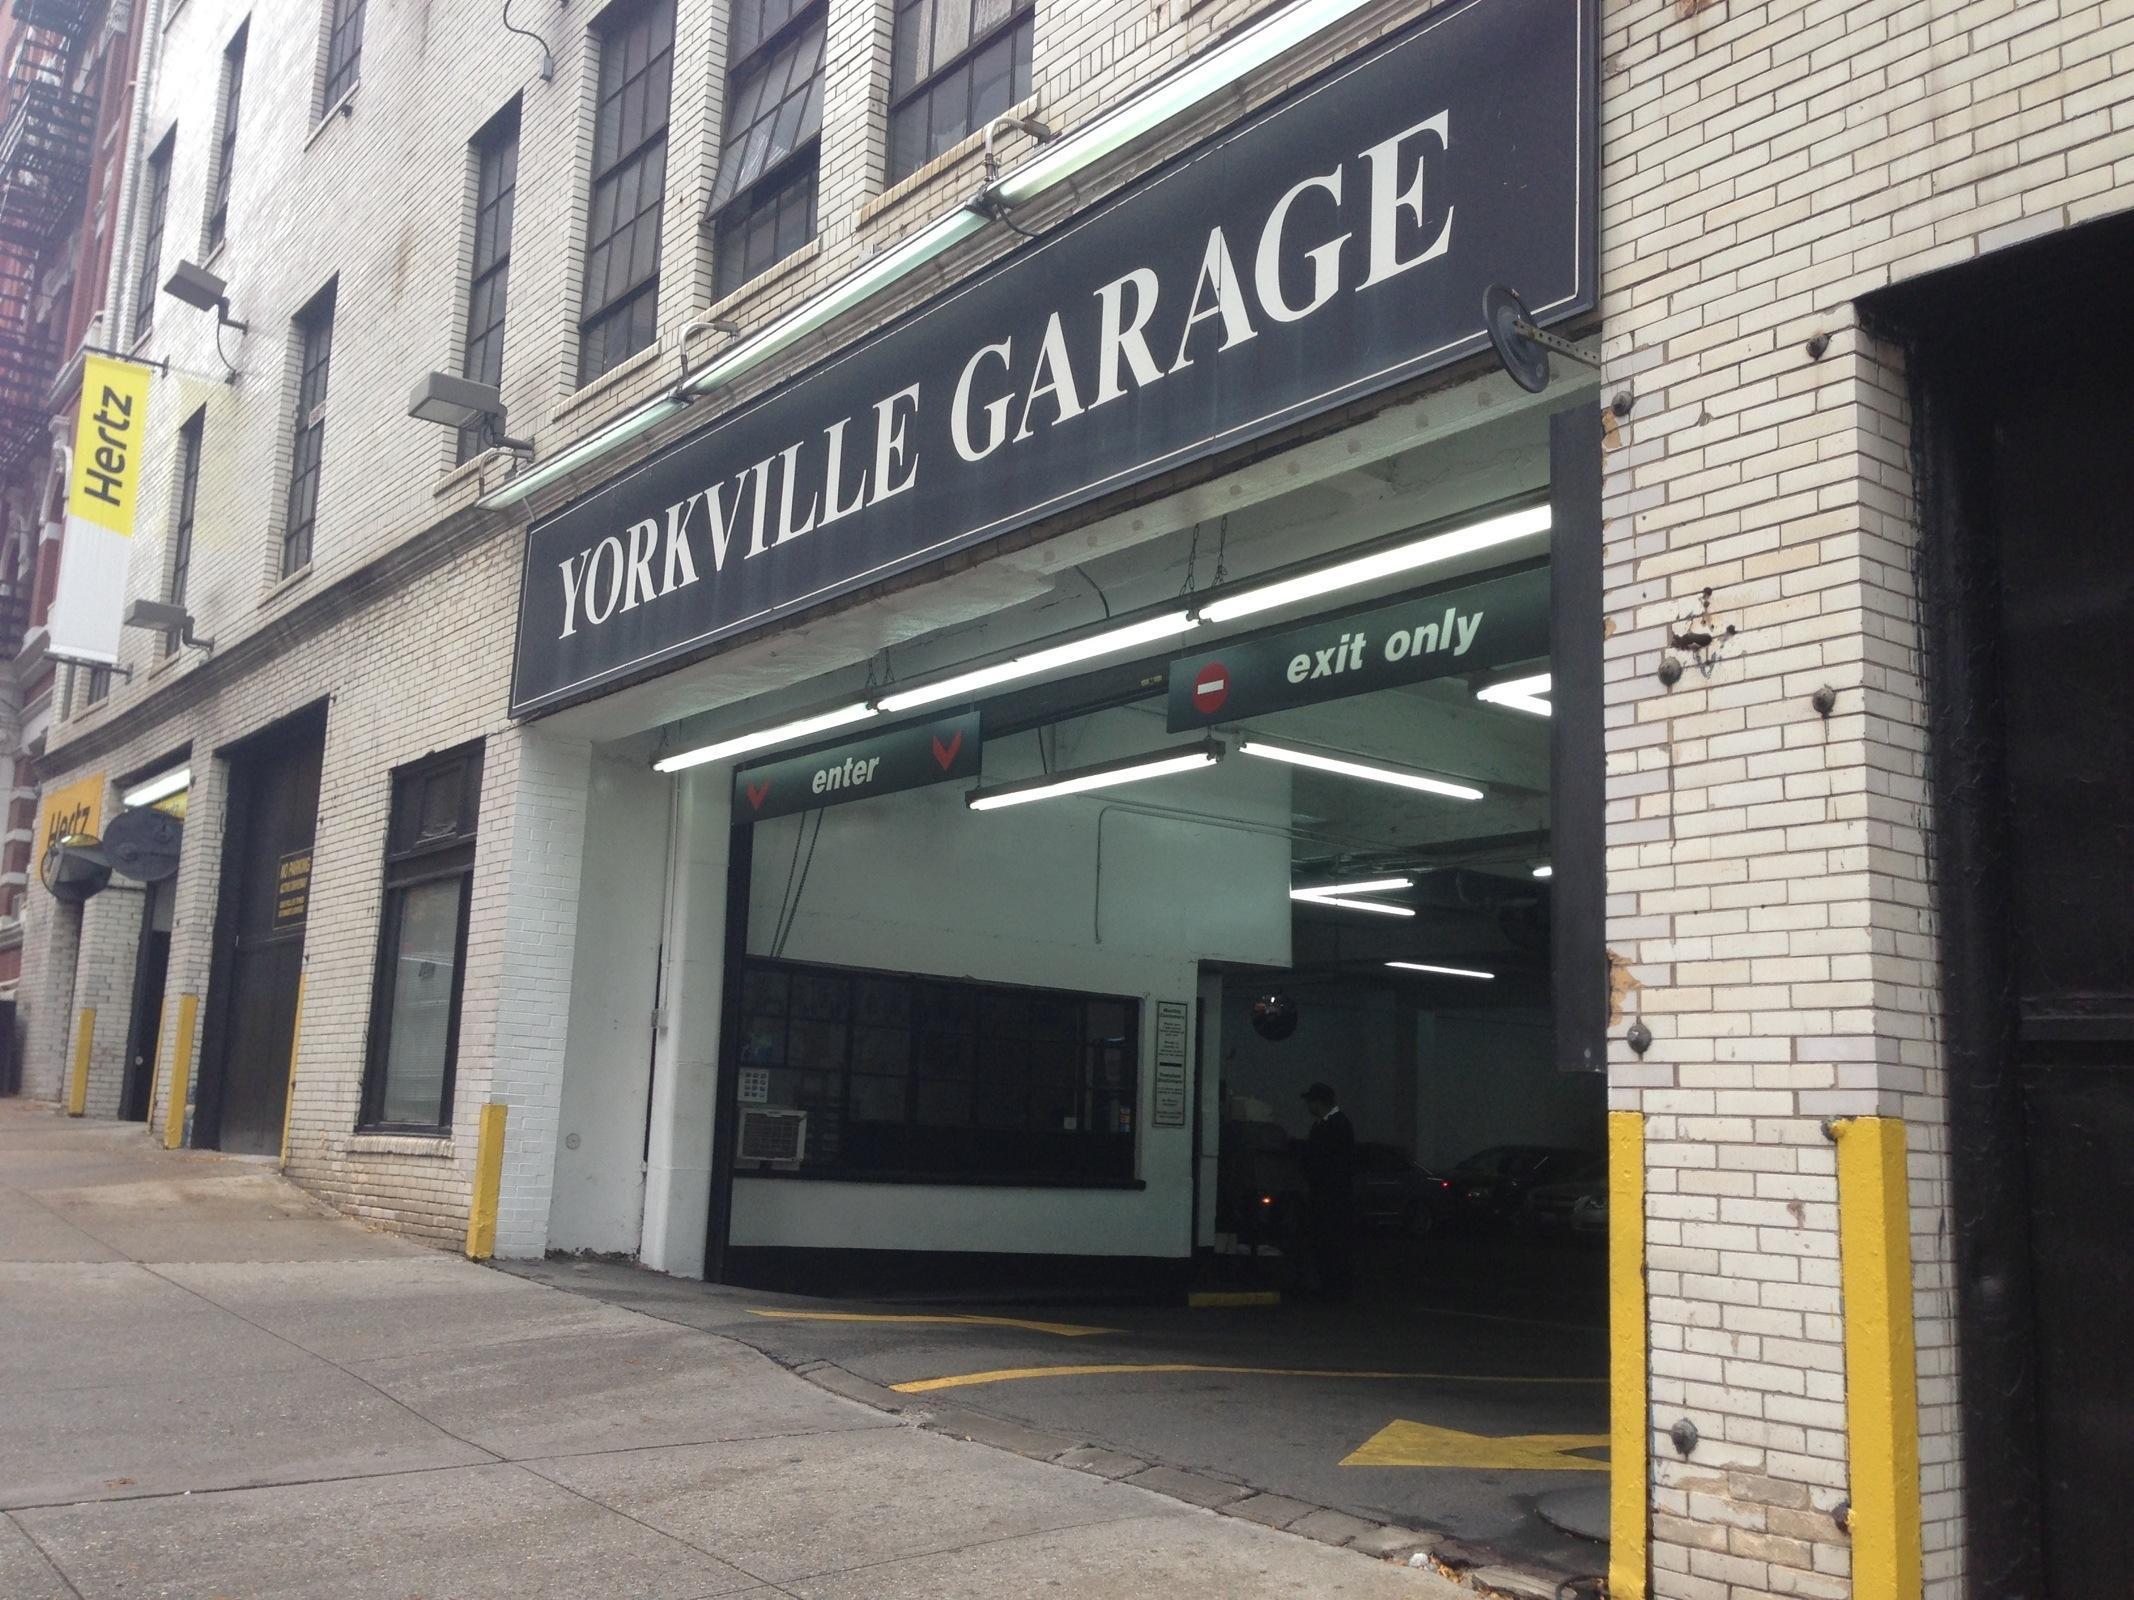 Yorkville garage parking in new york parkme for New york parking garage